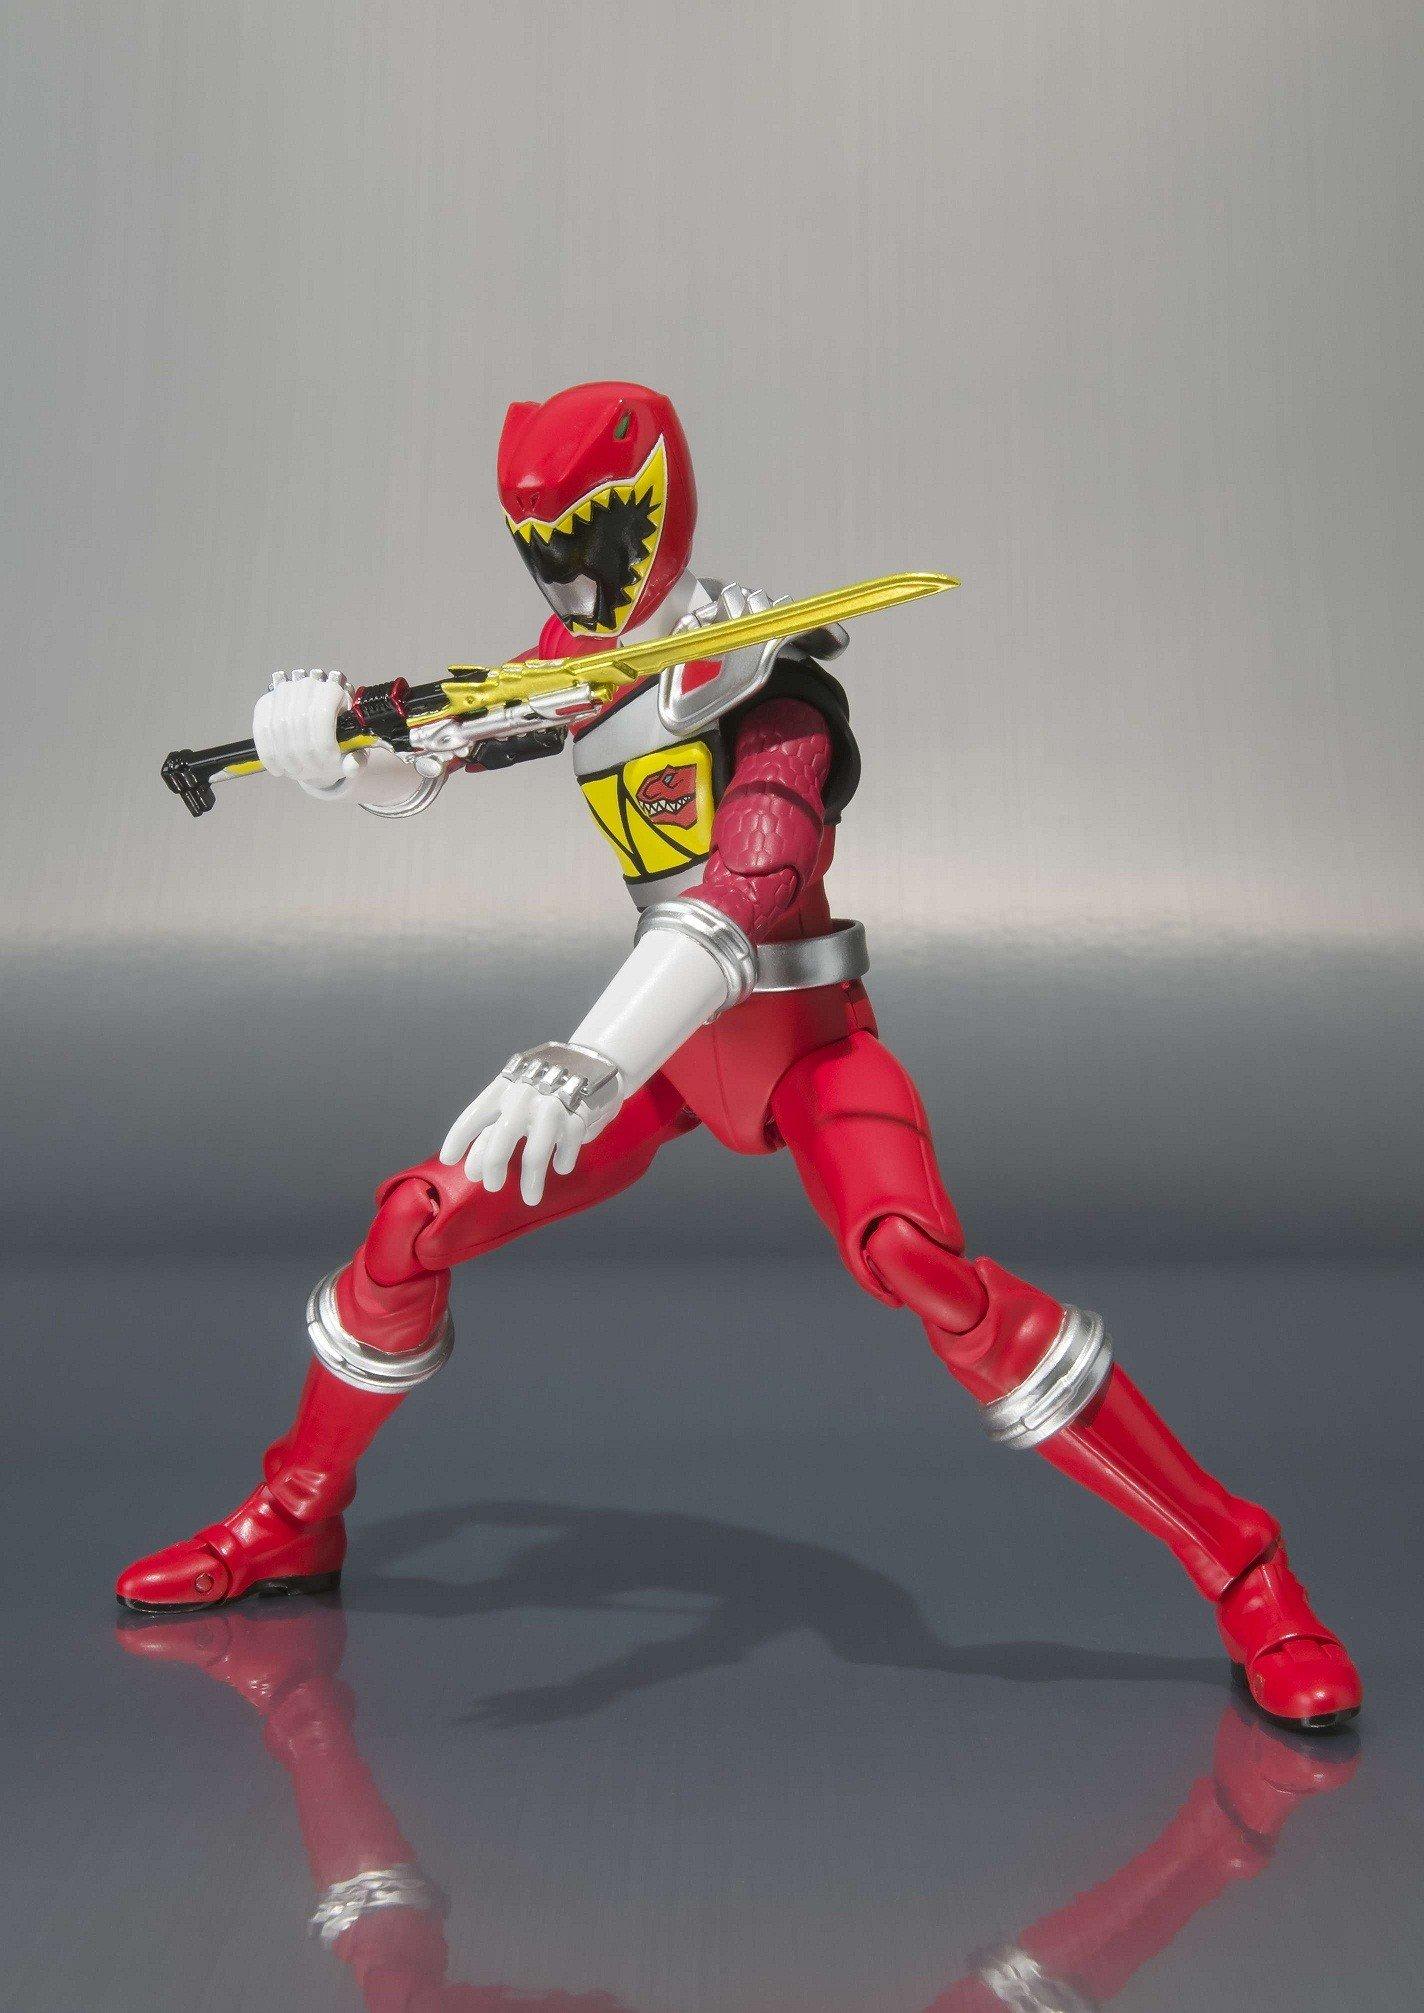 S.H Figuarts Zyuden Sentai Kyoryuger KYORYU RED power ranger Dino Super charge